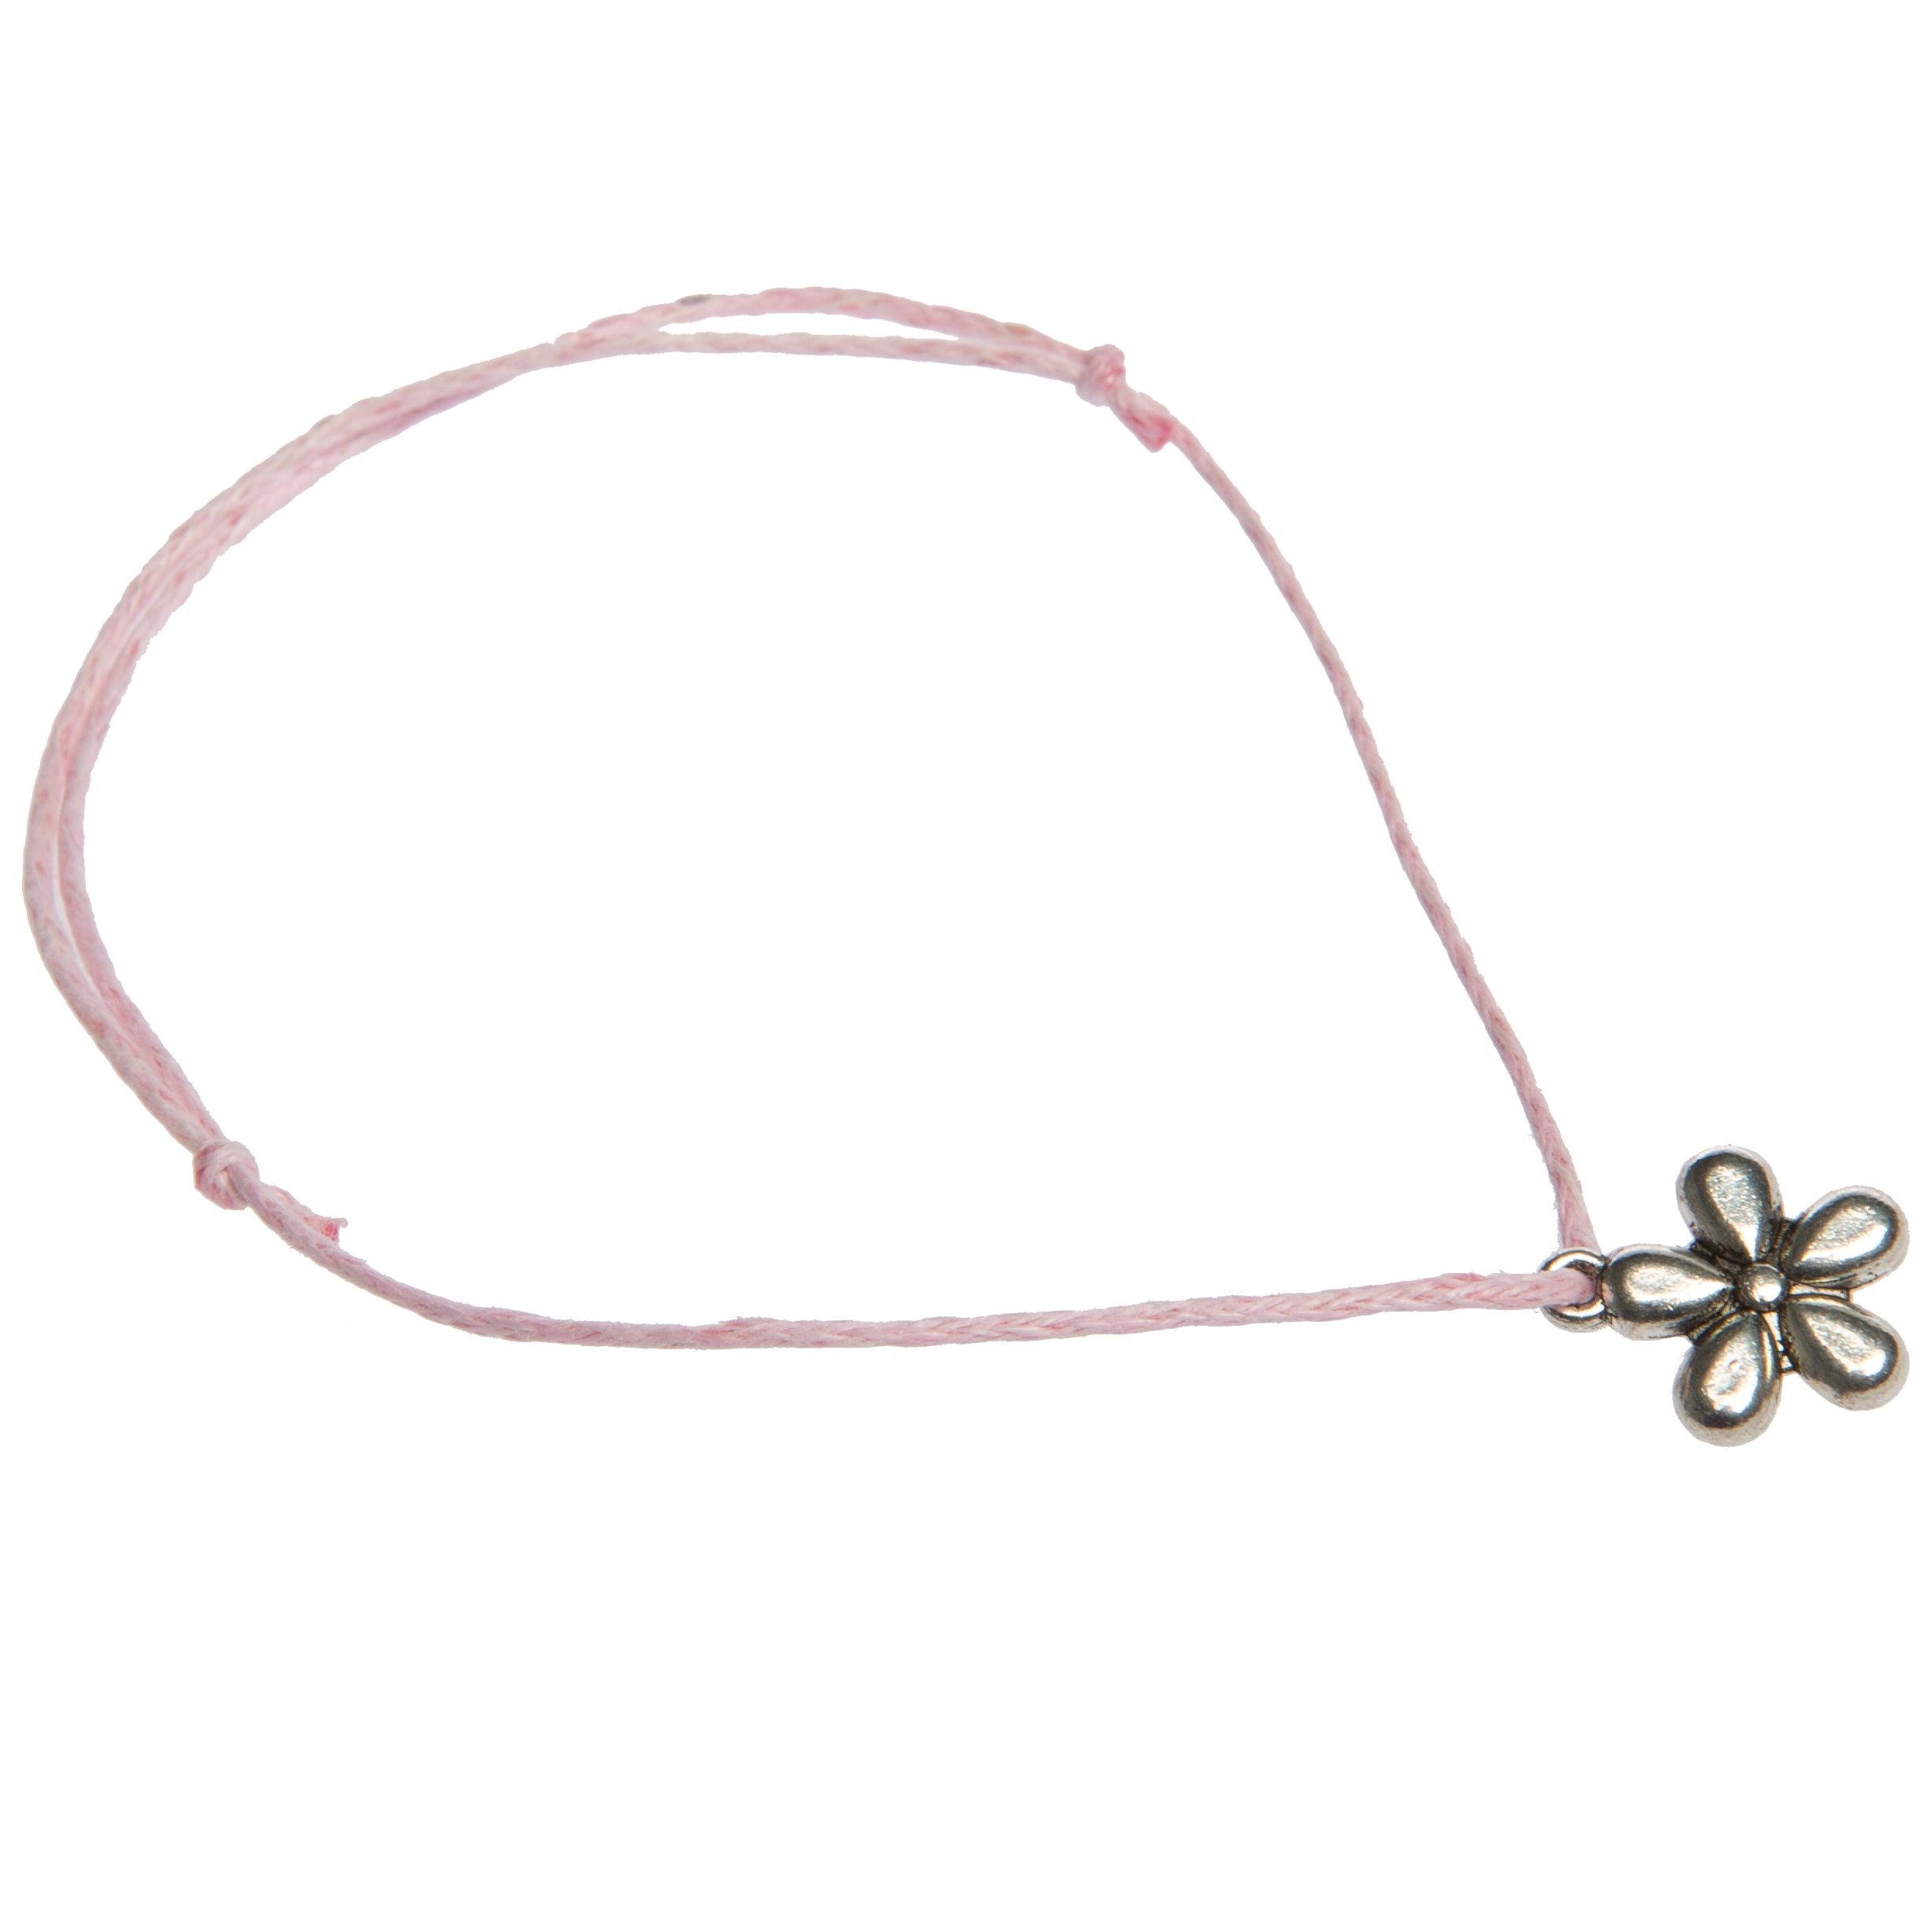 jelly button jewellery adjustable charm bracelet